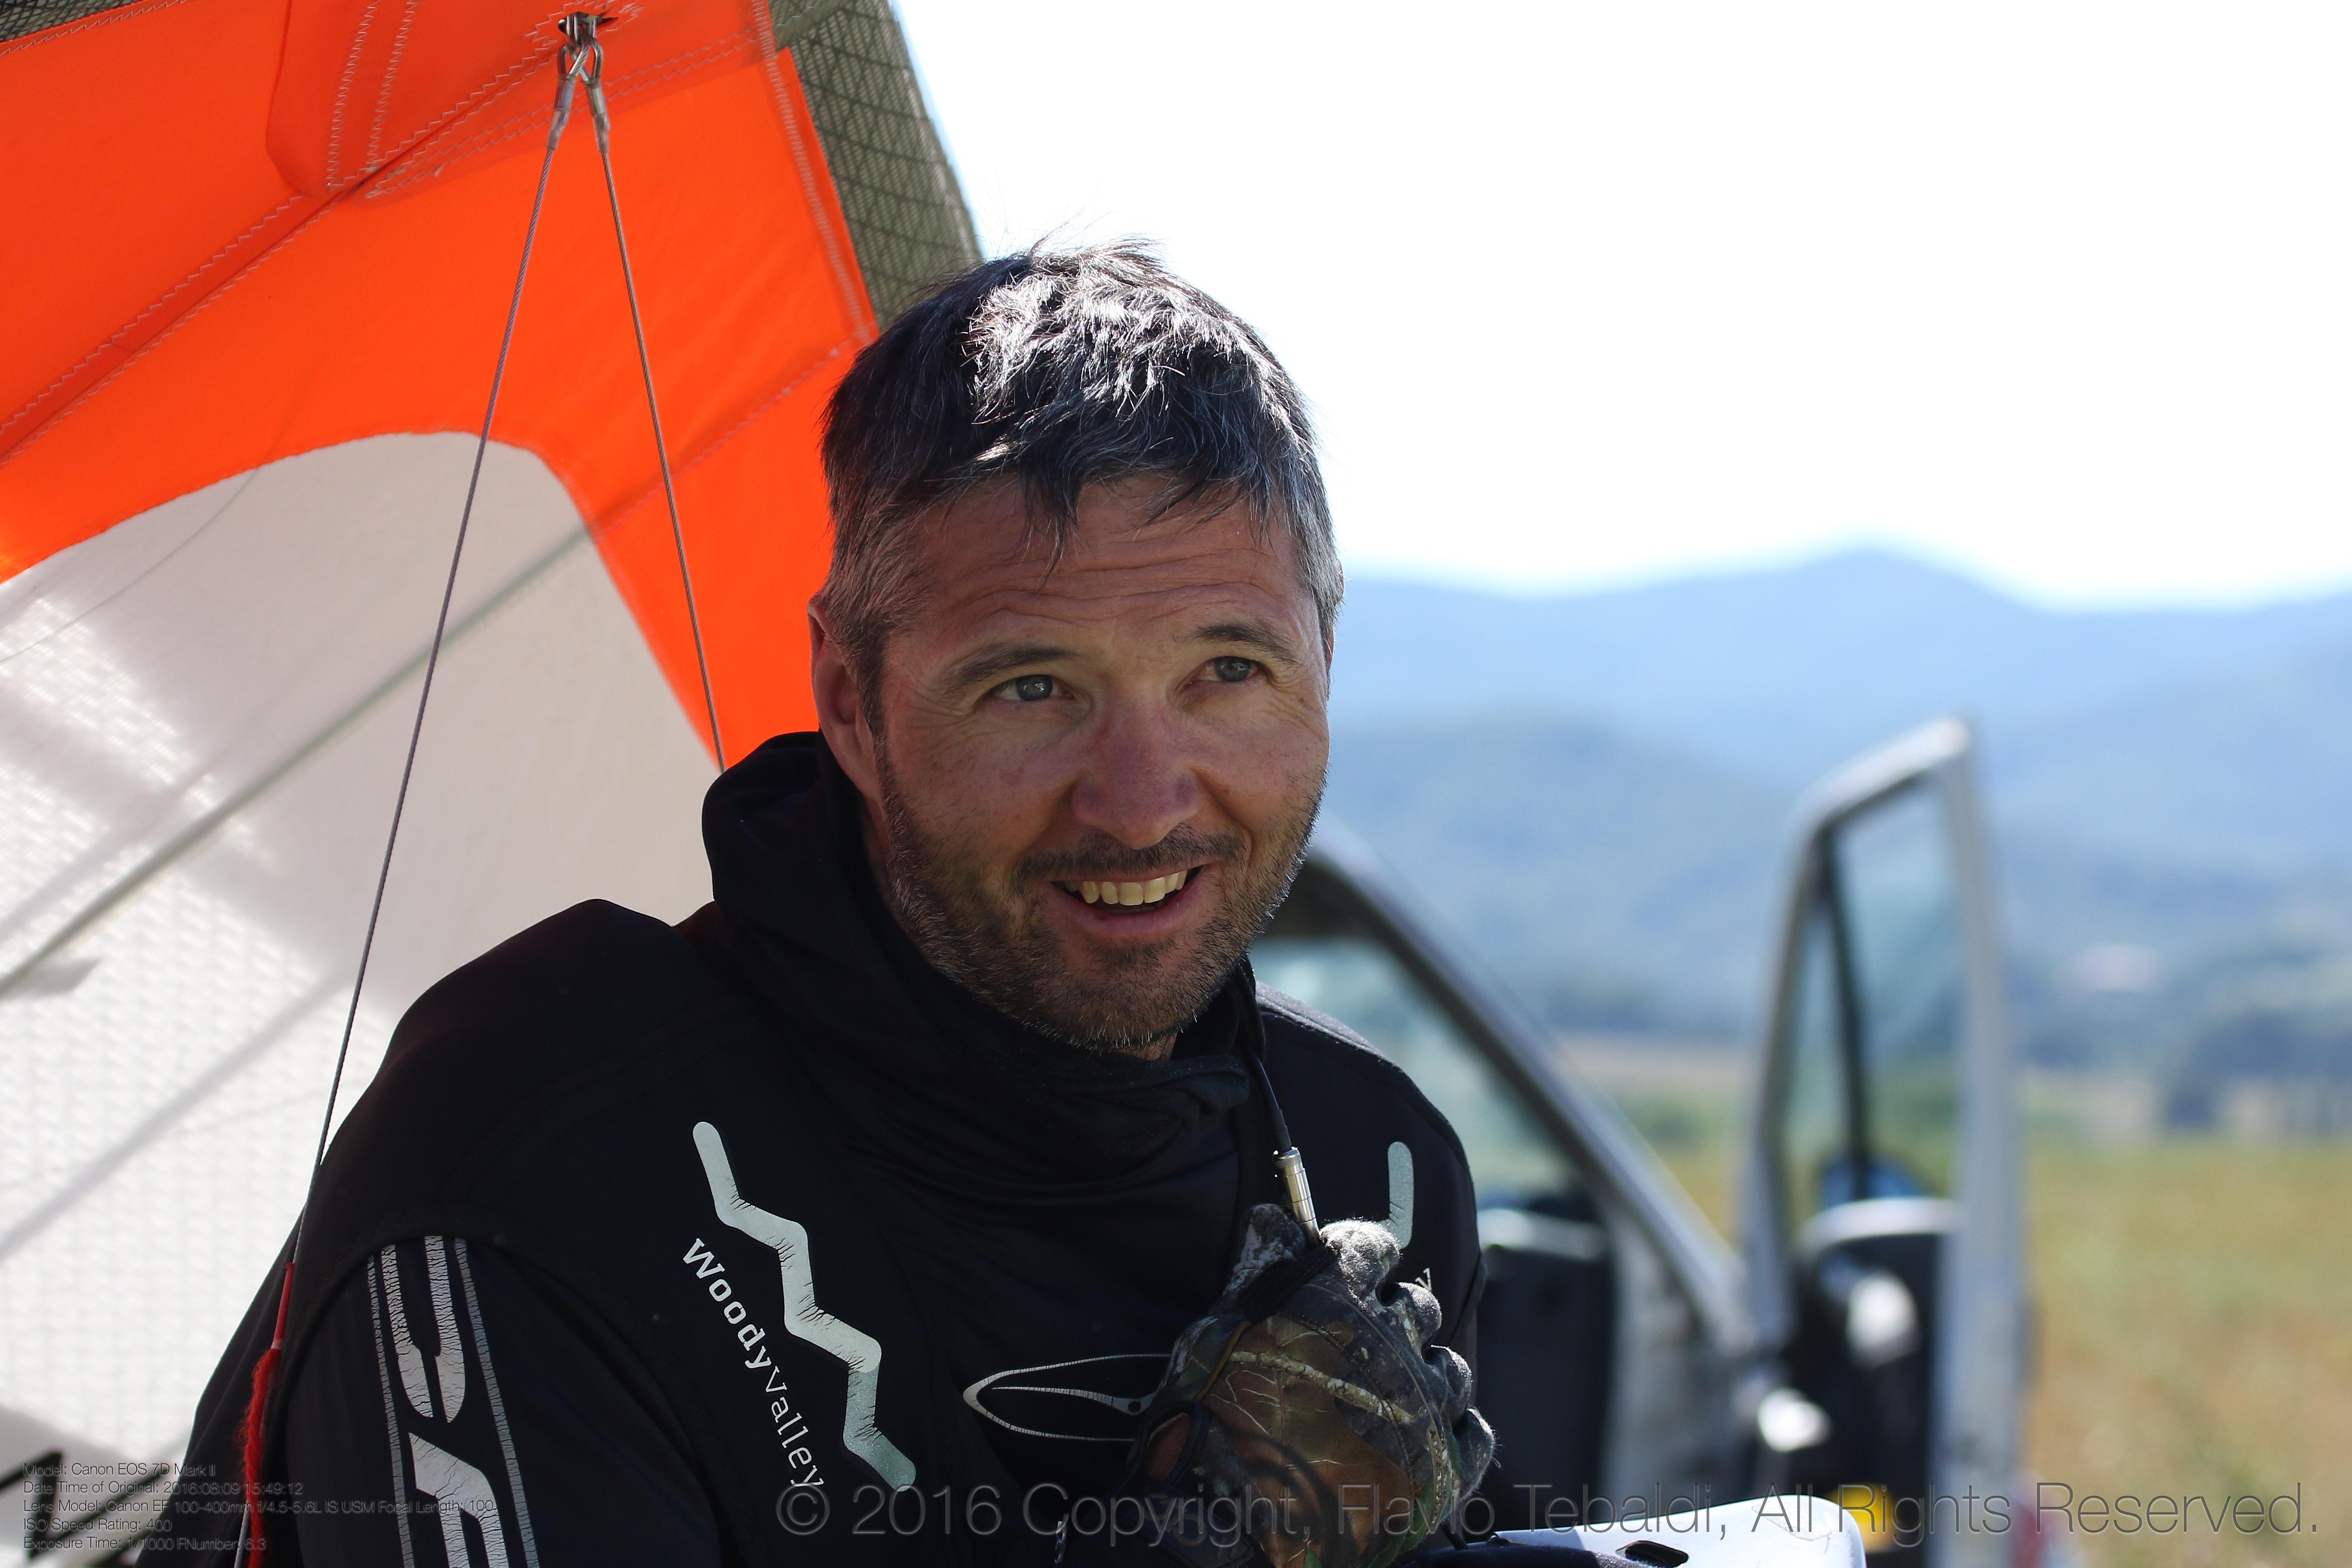 PILOT PROFILE: 60 seconds with hang gliding champion Christian Ciech